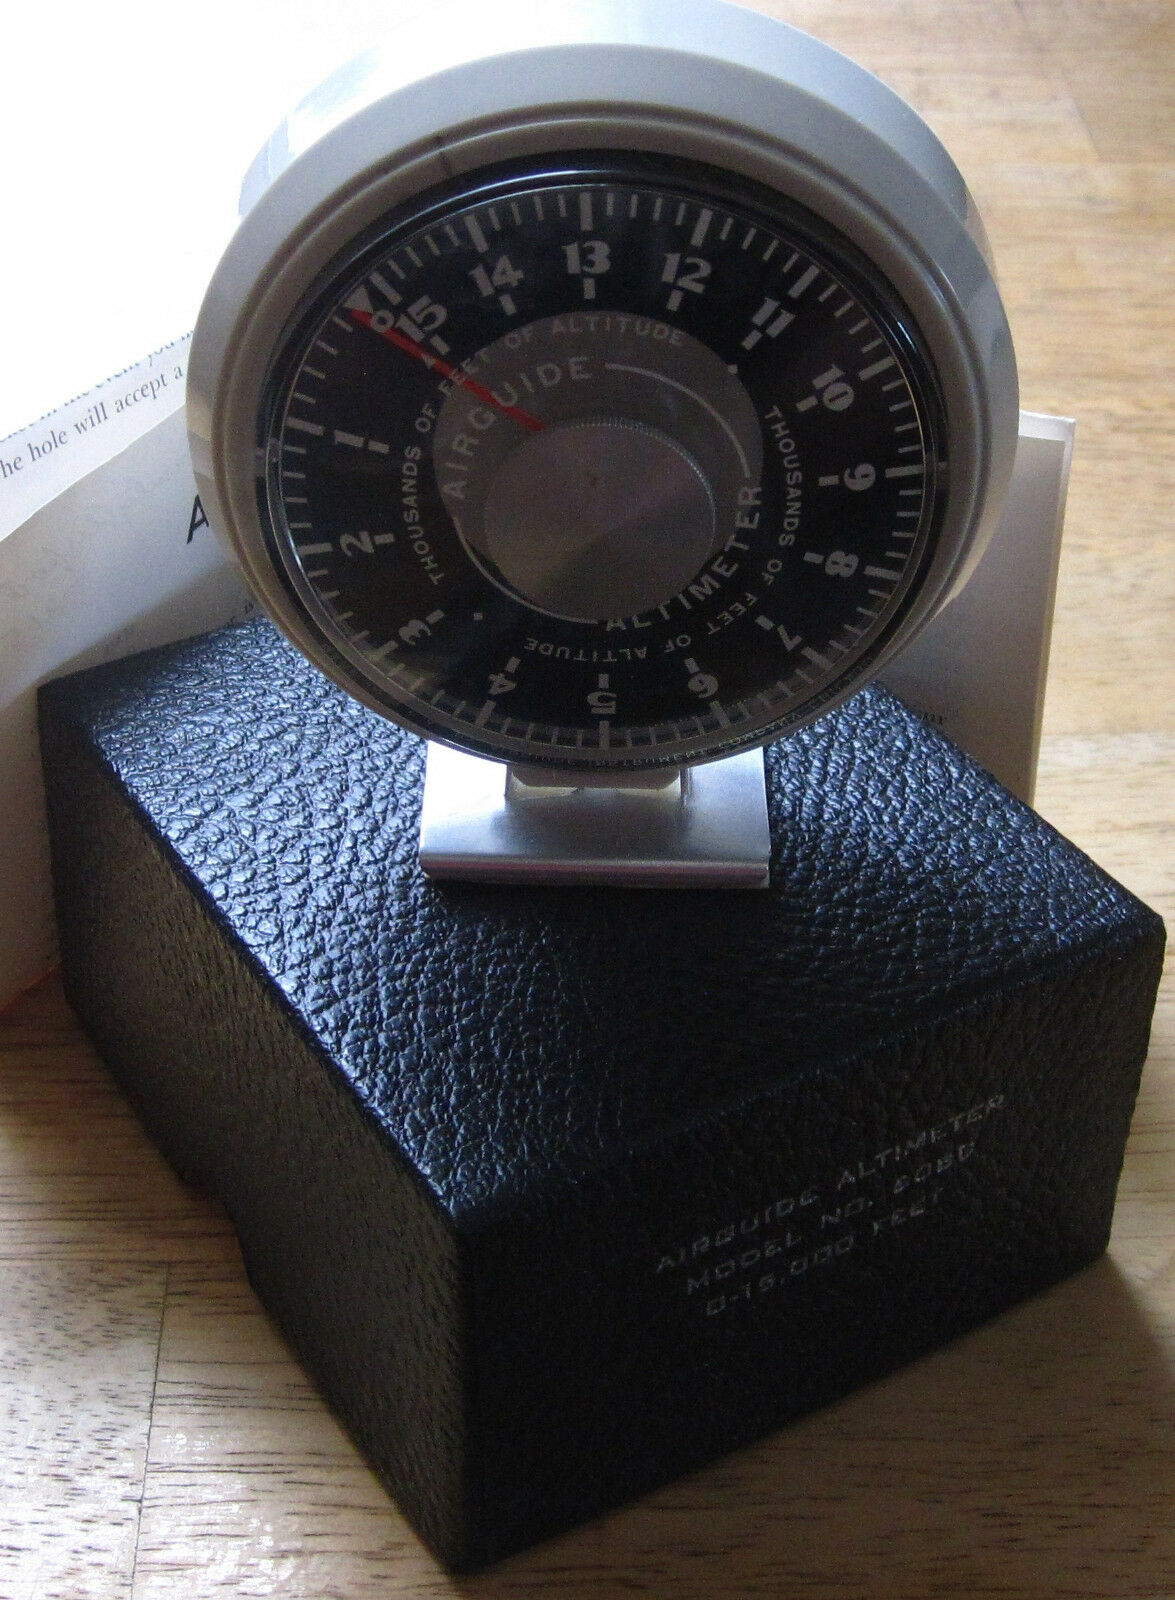 AIRGUIDE VINTAGE ALTIMETER, MODEL 608C, 0-15,000 FEET, MADE ... on